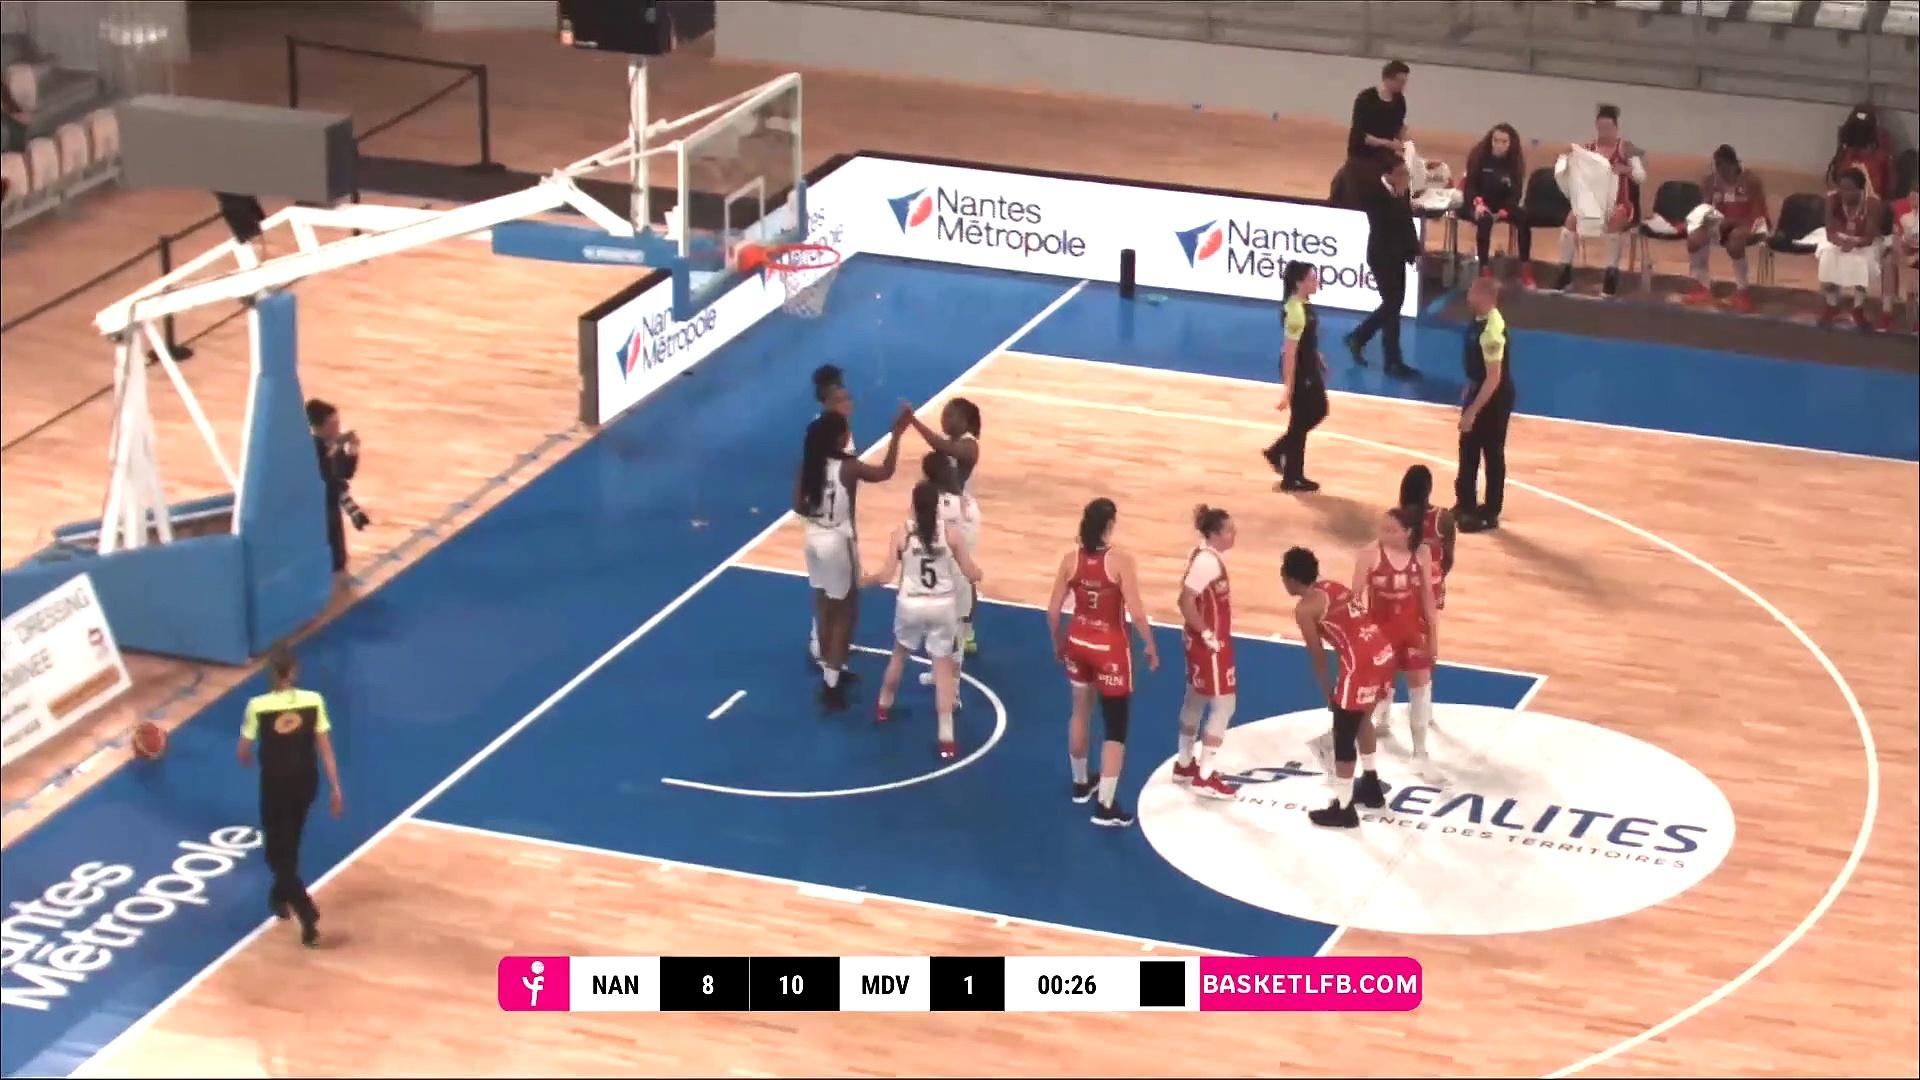 Basketball De Féminine Lfb Basketball Féminine TvLigue Lfb TvLigue De Lfb OiuPkXwTZ